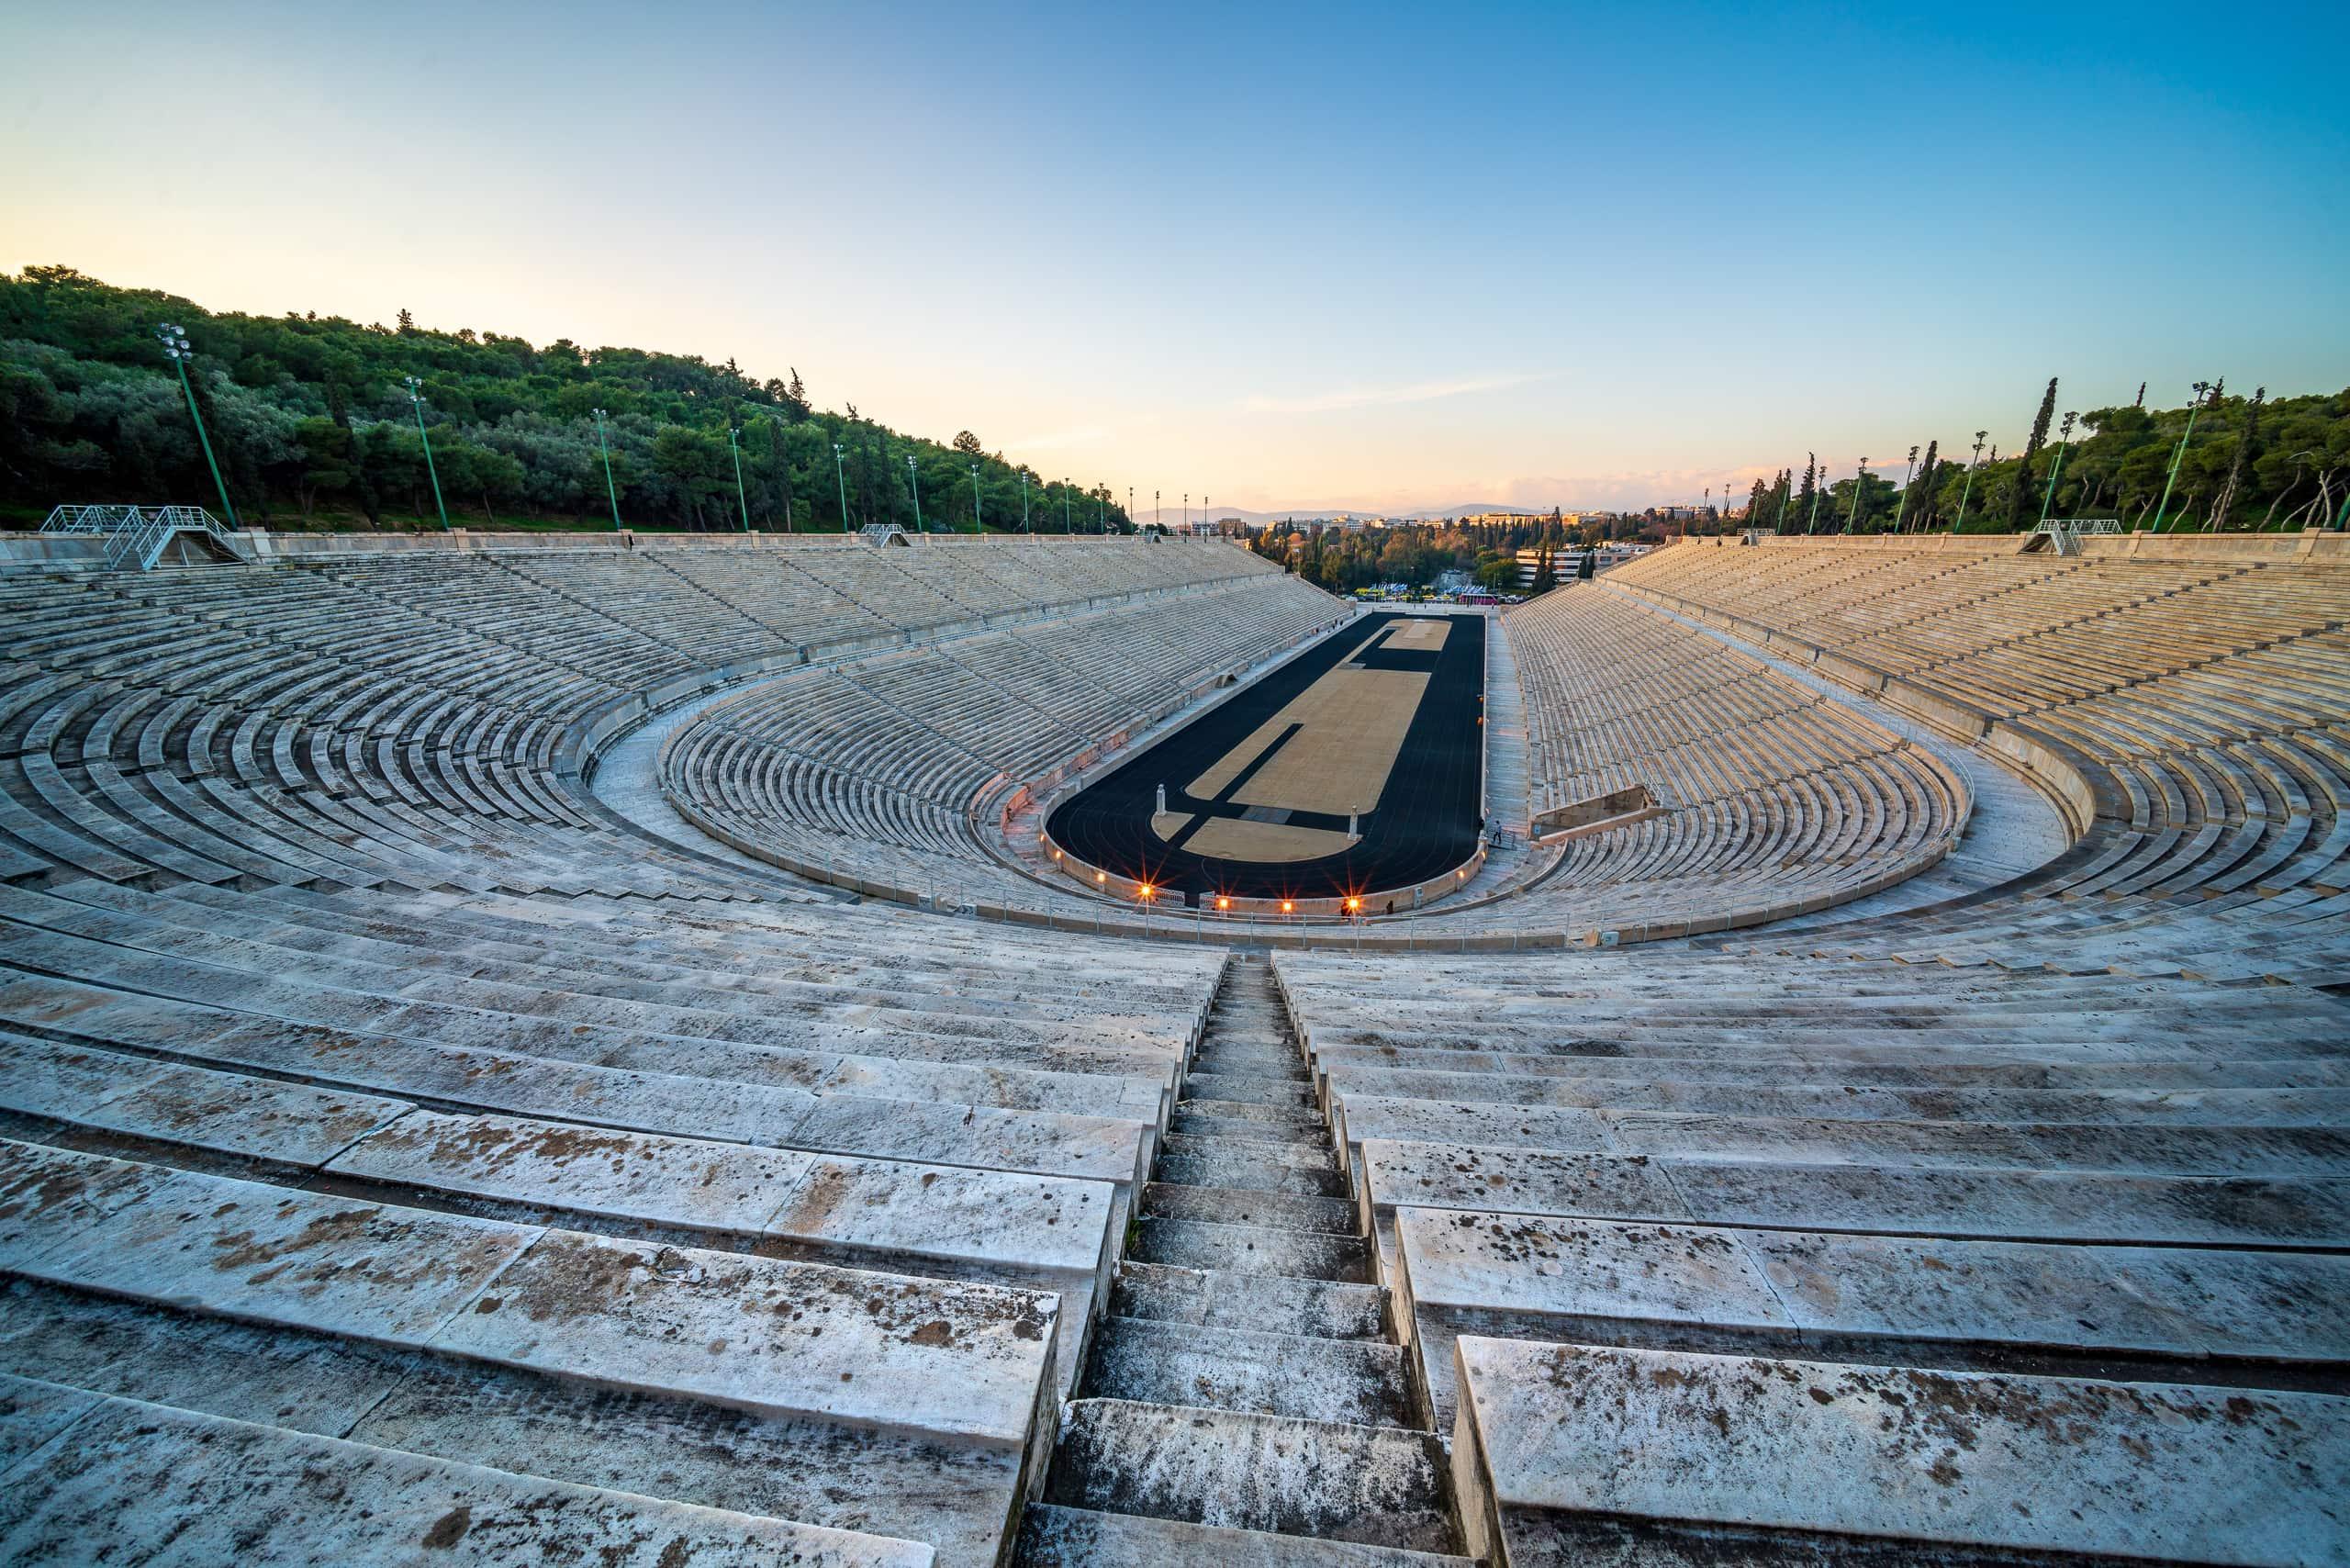 Panathenaic Stadium - Athens | f/8 1/50sec ISO-100 12mm  | ILCE-7RM3